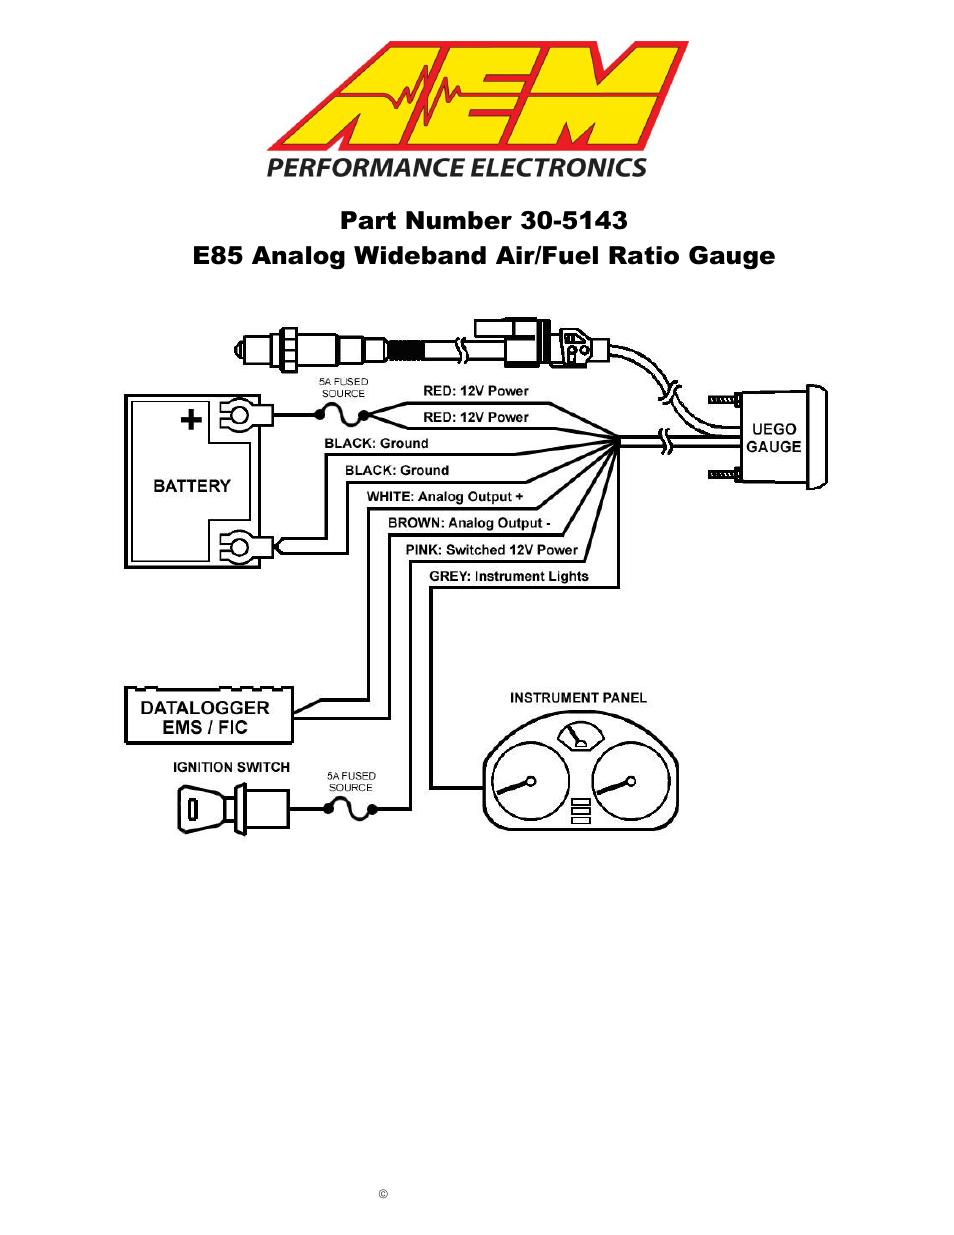 medium resolution of aem wideband wiring diagram wiring diagram value civic aem wideband wiring diagram